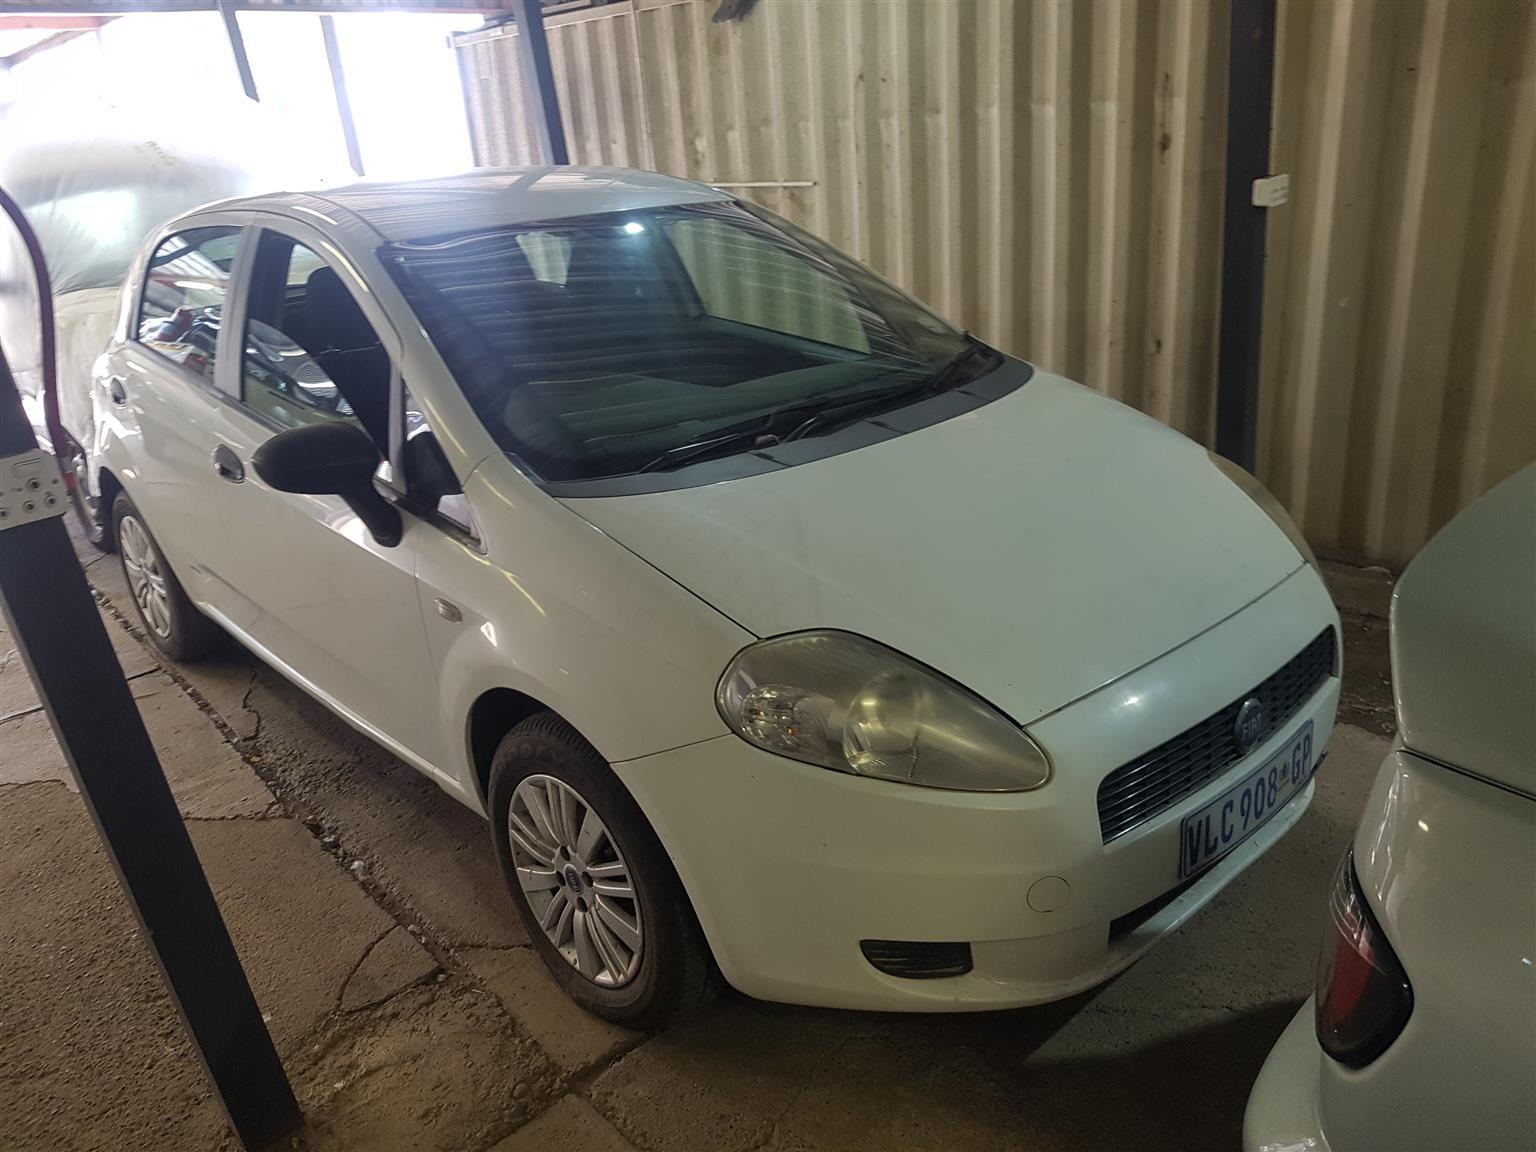 2005 Fiat Punto Grande  1.4 5 door Active